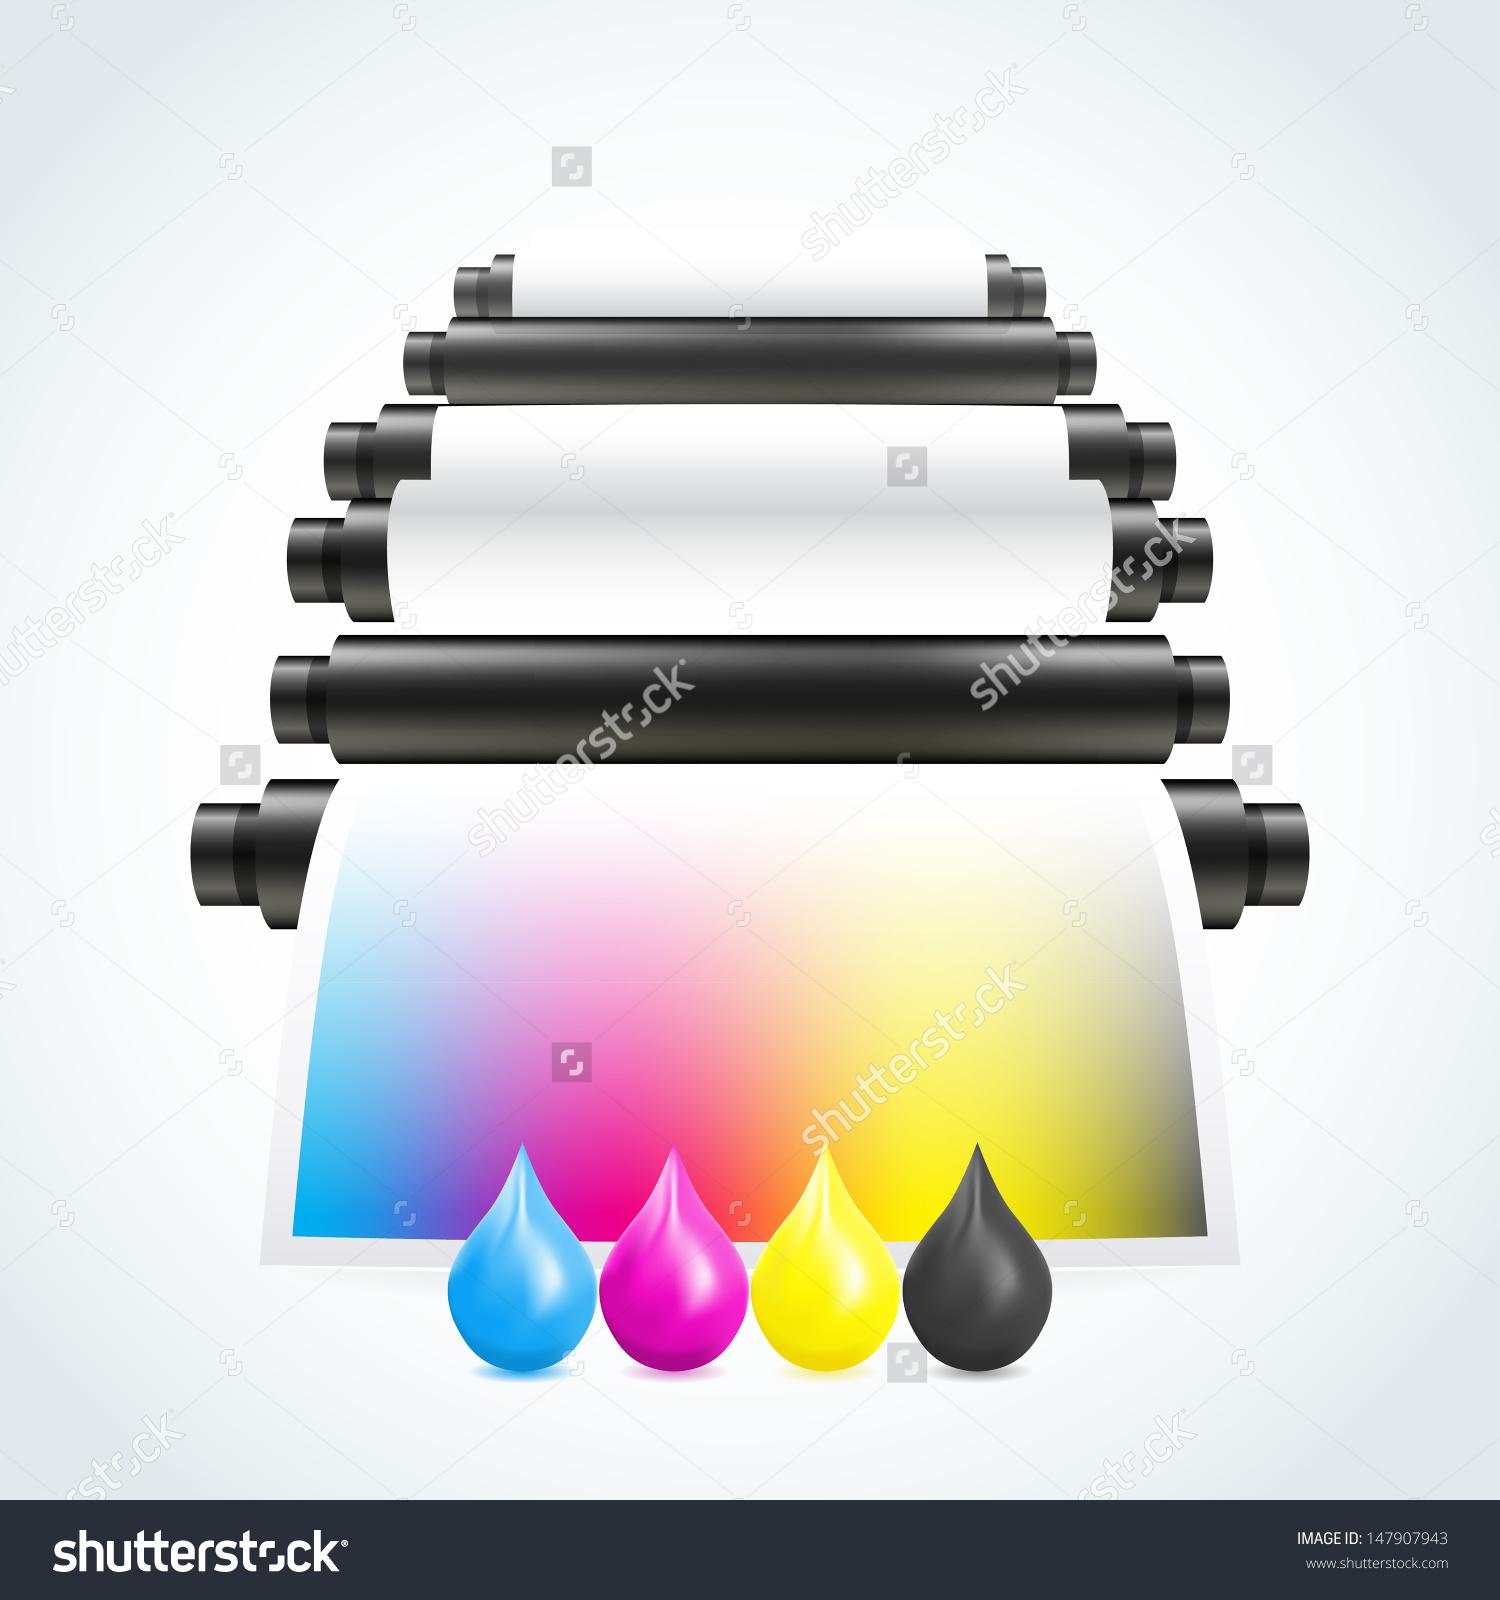 Printing Machine Stock Vector 147907943.